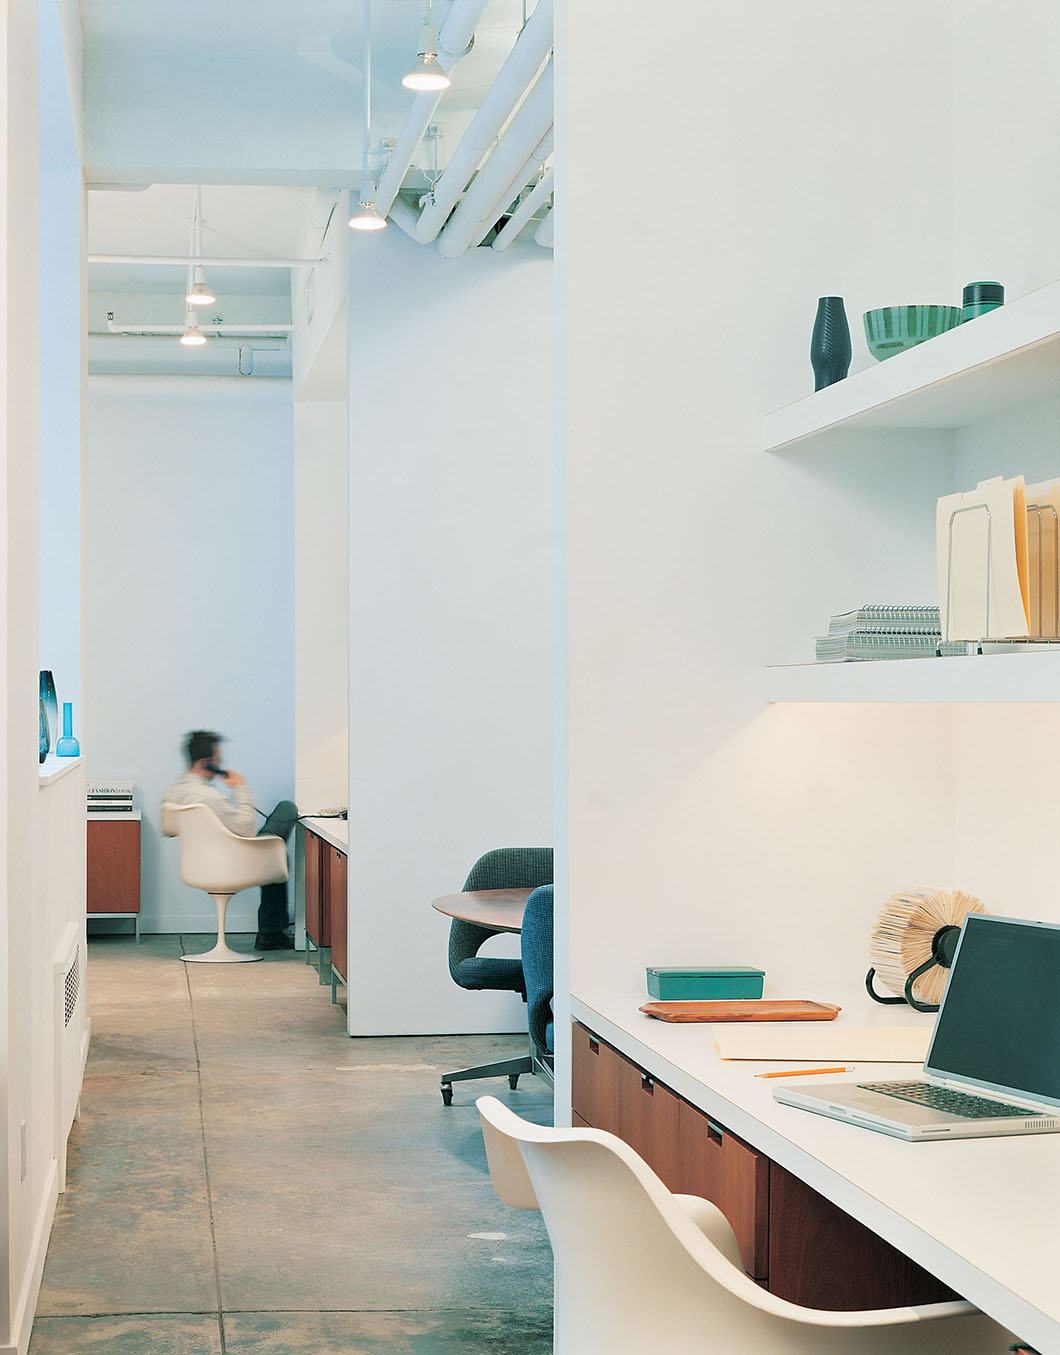 Chelsea Loft by Messana O'Rorke   PC: Elizabeth Felicella / Esto Photographics   Featured: Saarinen Tulip Chair, Executive Armless Chair with Swivel Base, Florence Knoll Table Desk